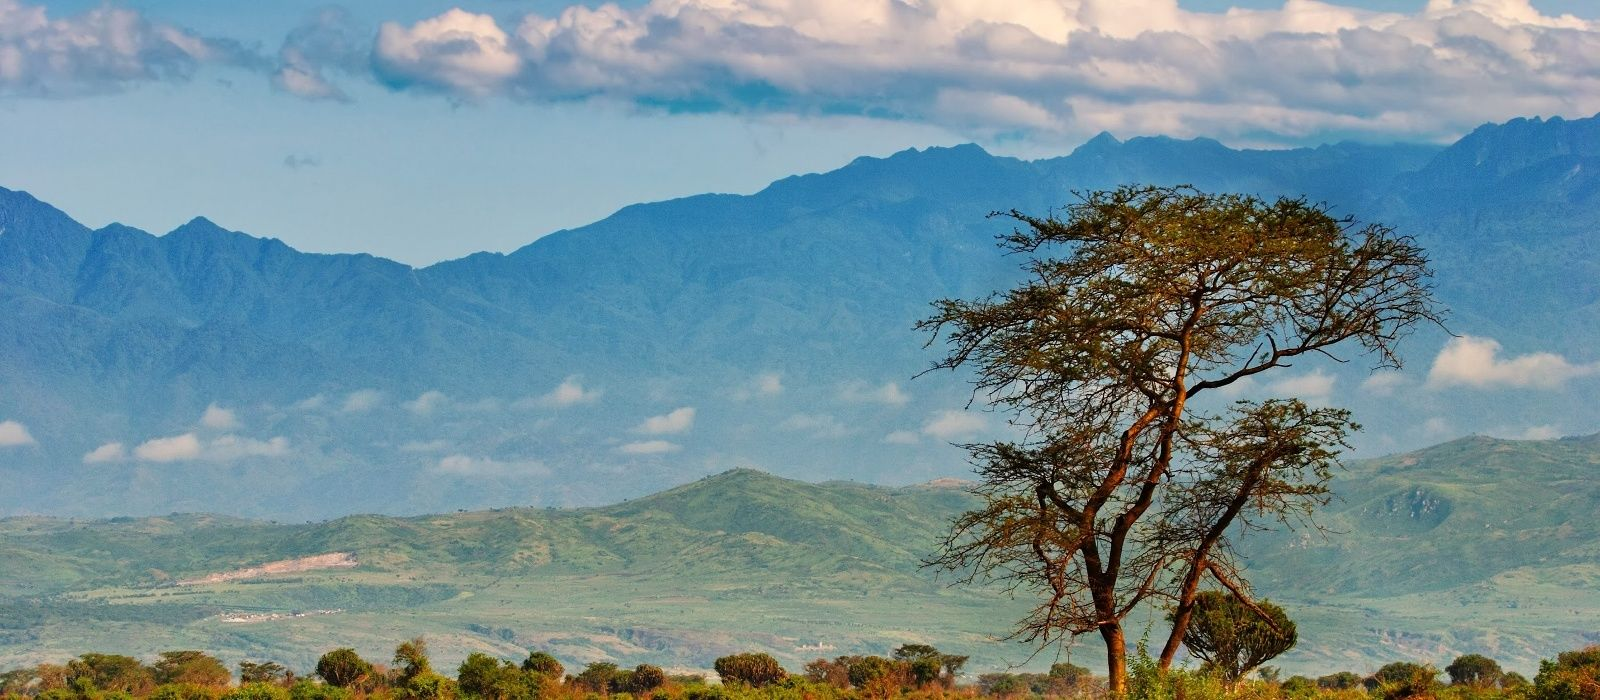 Reiseziel Queen Elisabeth Uganda